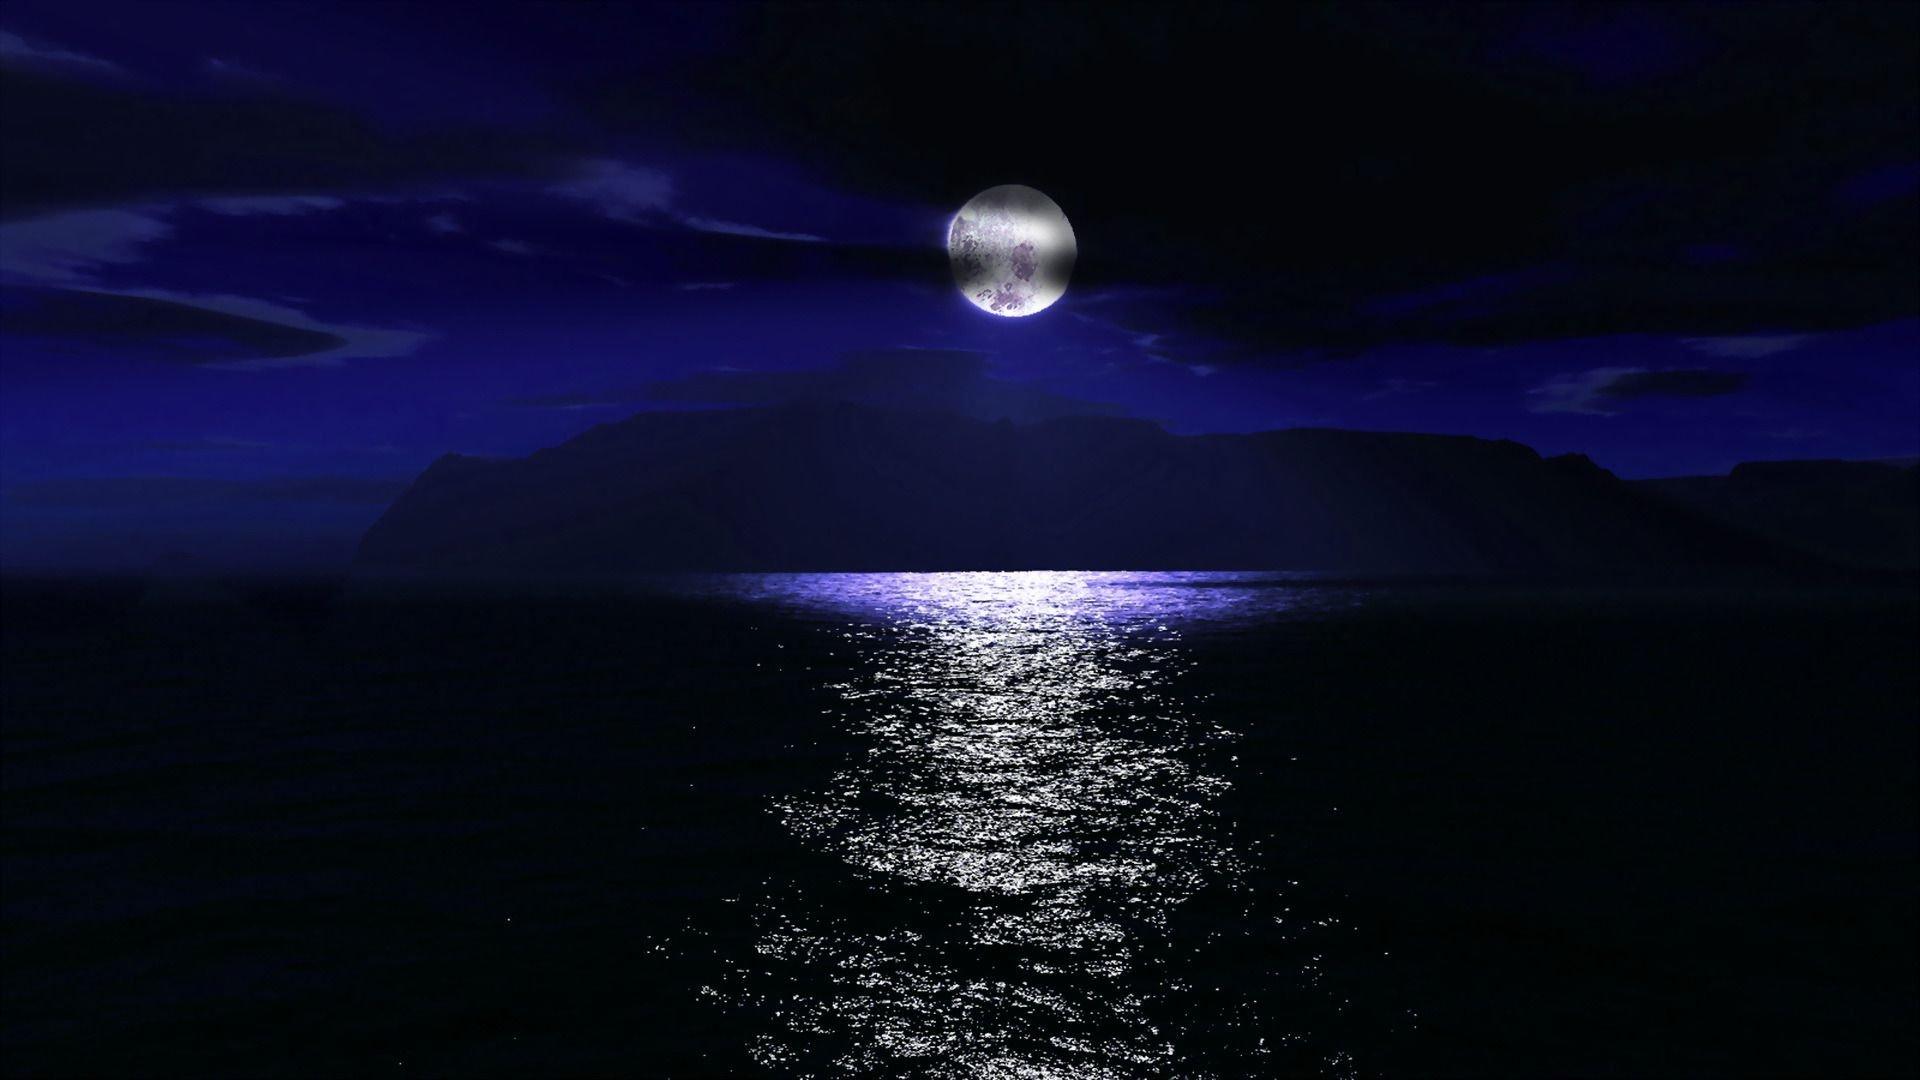 night-sky-moon-cloud-sea-ocean